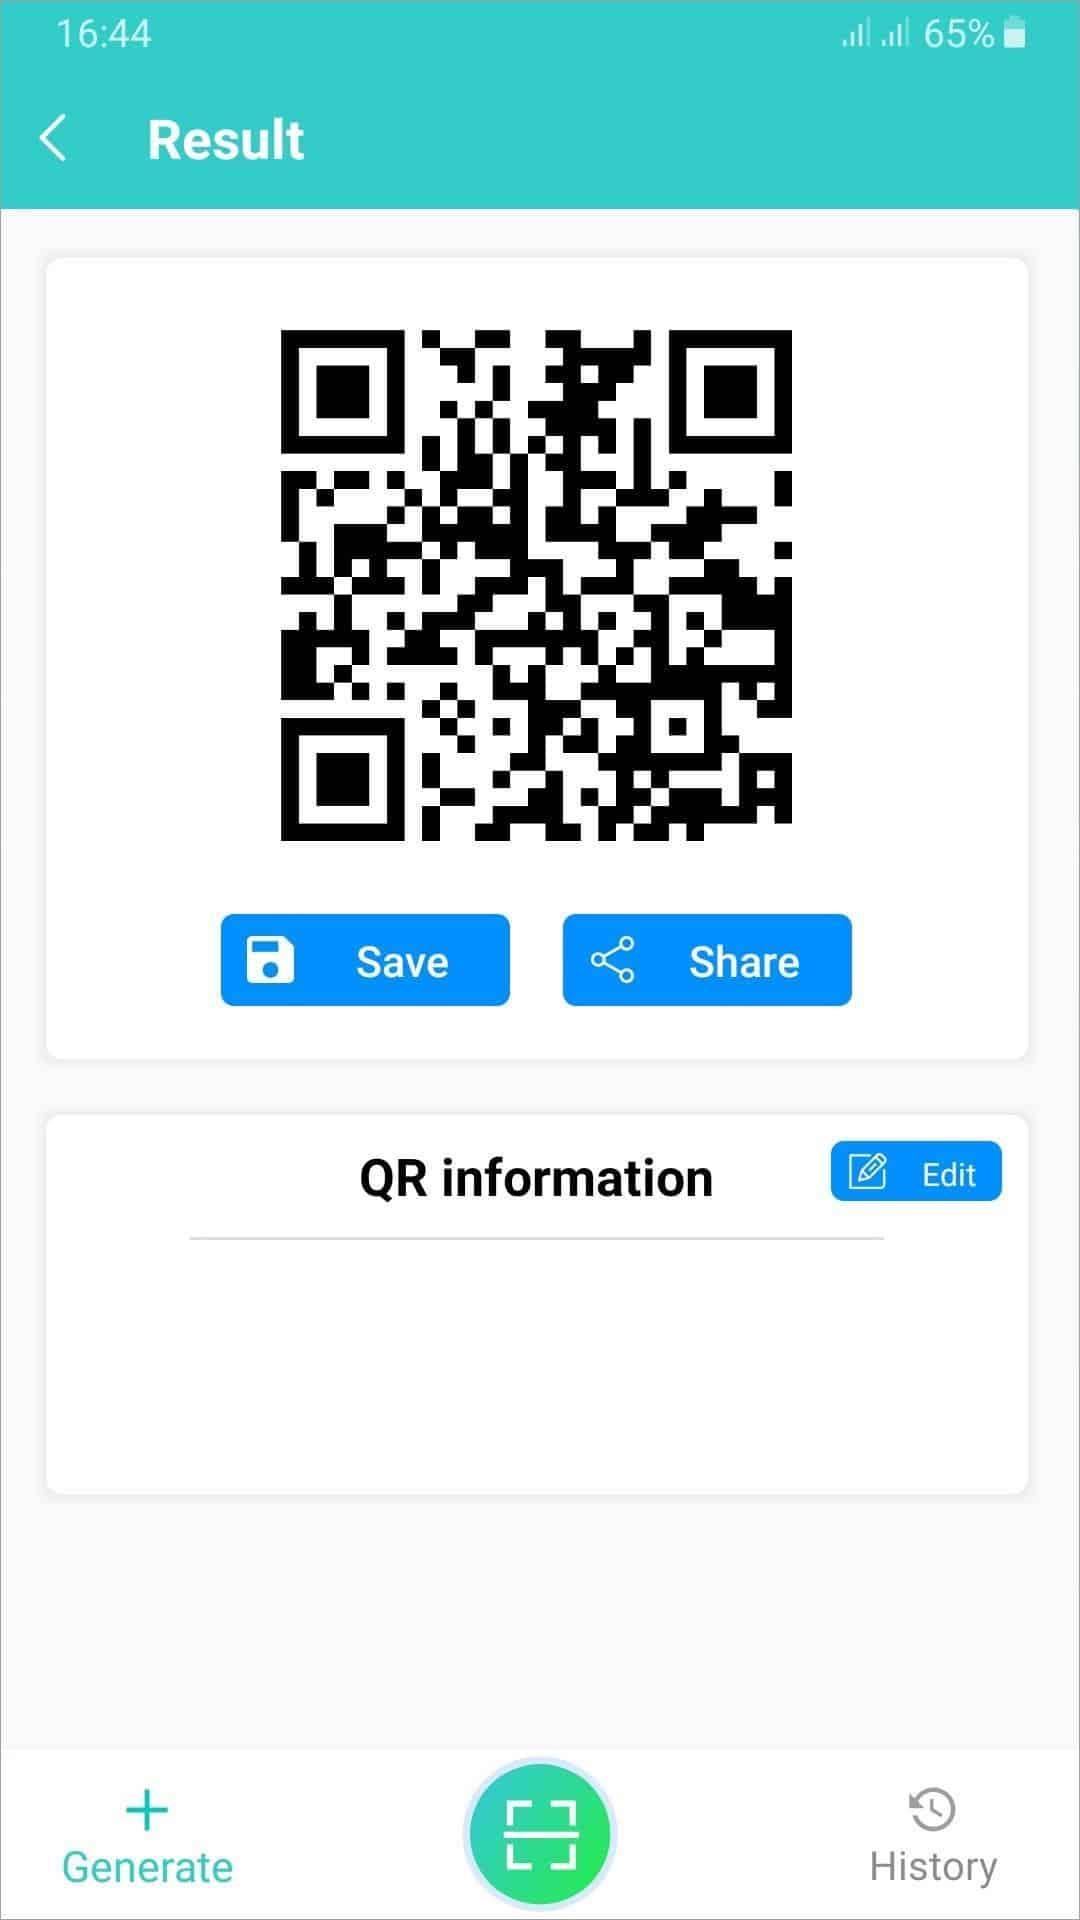 Jika-aplikasi-sudah-terbuka-tap-pada-tombol-Simpan-untuk-menyimpan-hasil-barcode-lokasi-tersebut-dalam-bentuk-gambar